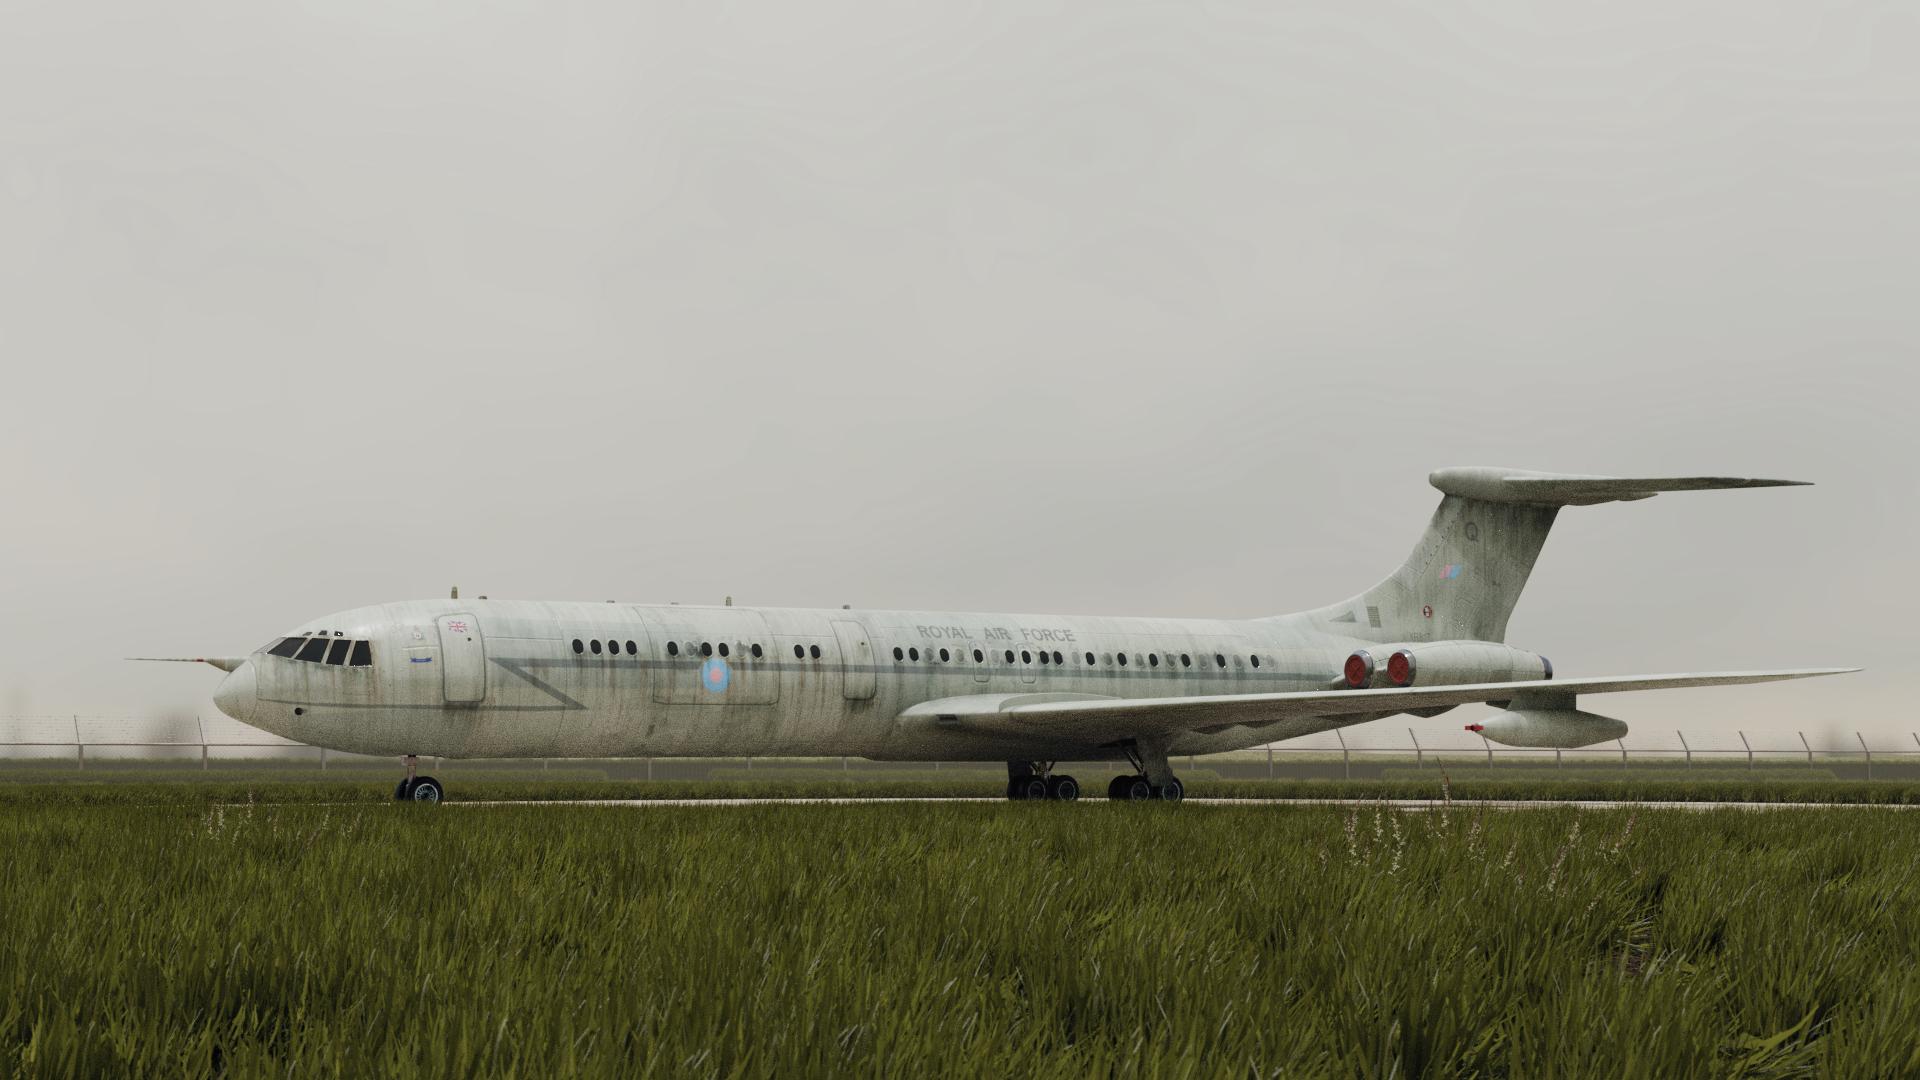 RAF Vickers VC-10